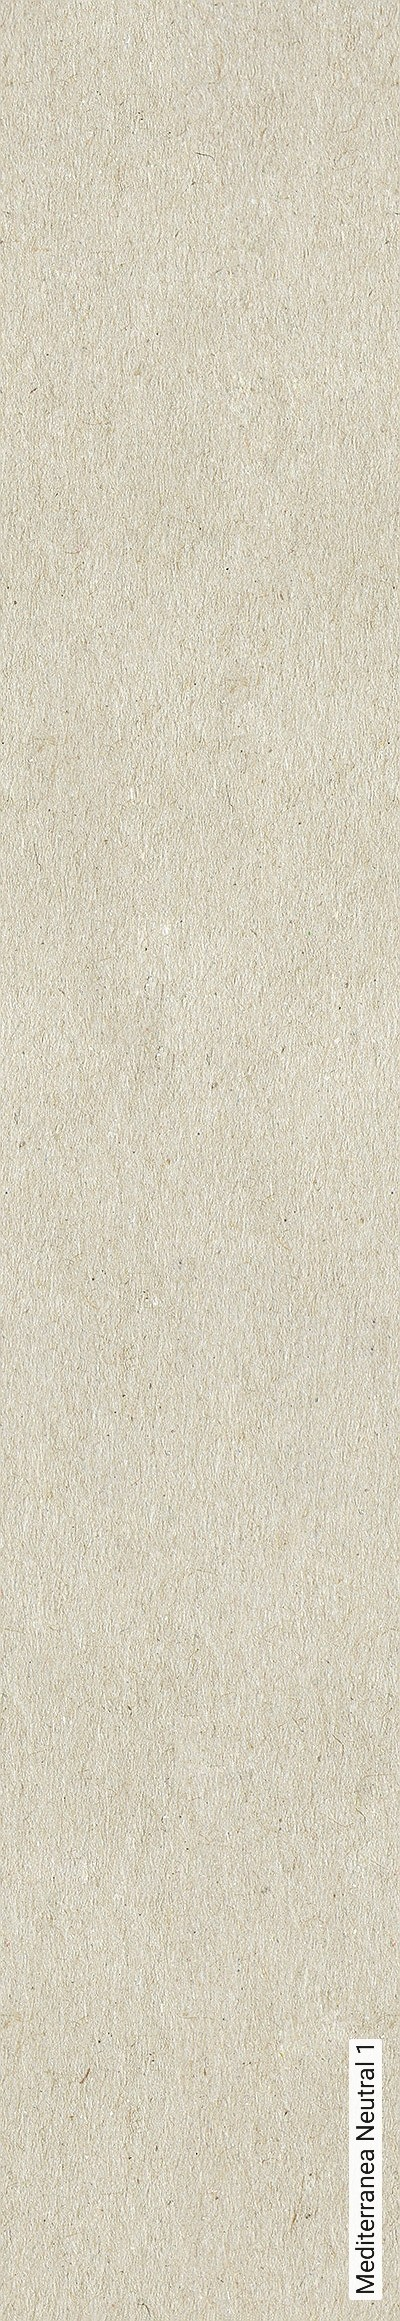 Mediterranea-Neutral-1-Uni-Moderne-Muster-Creme